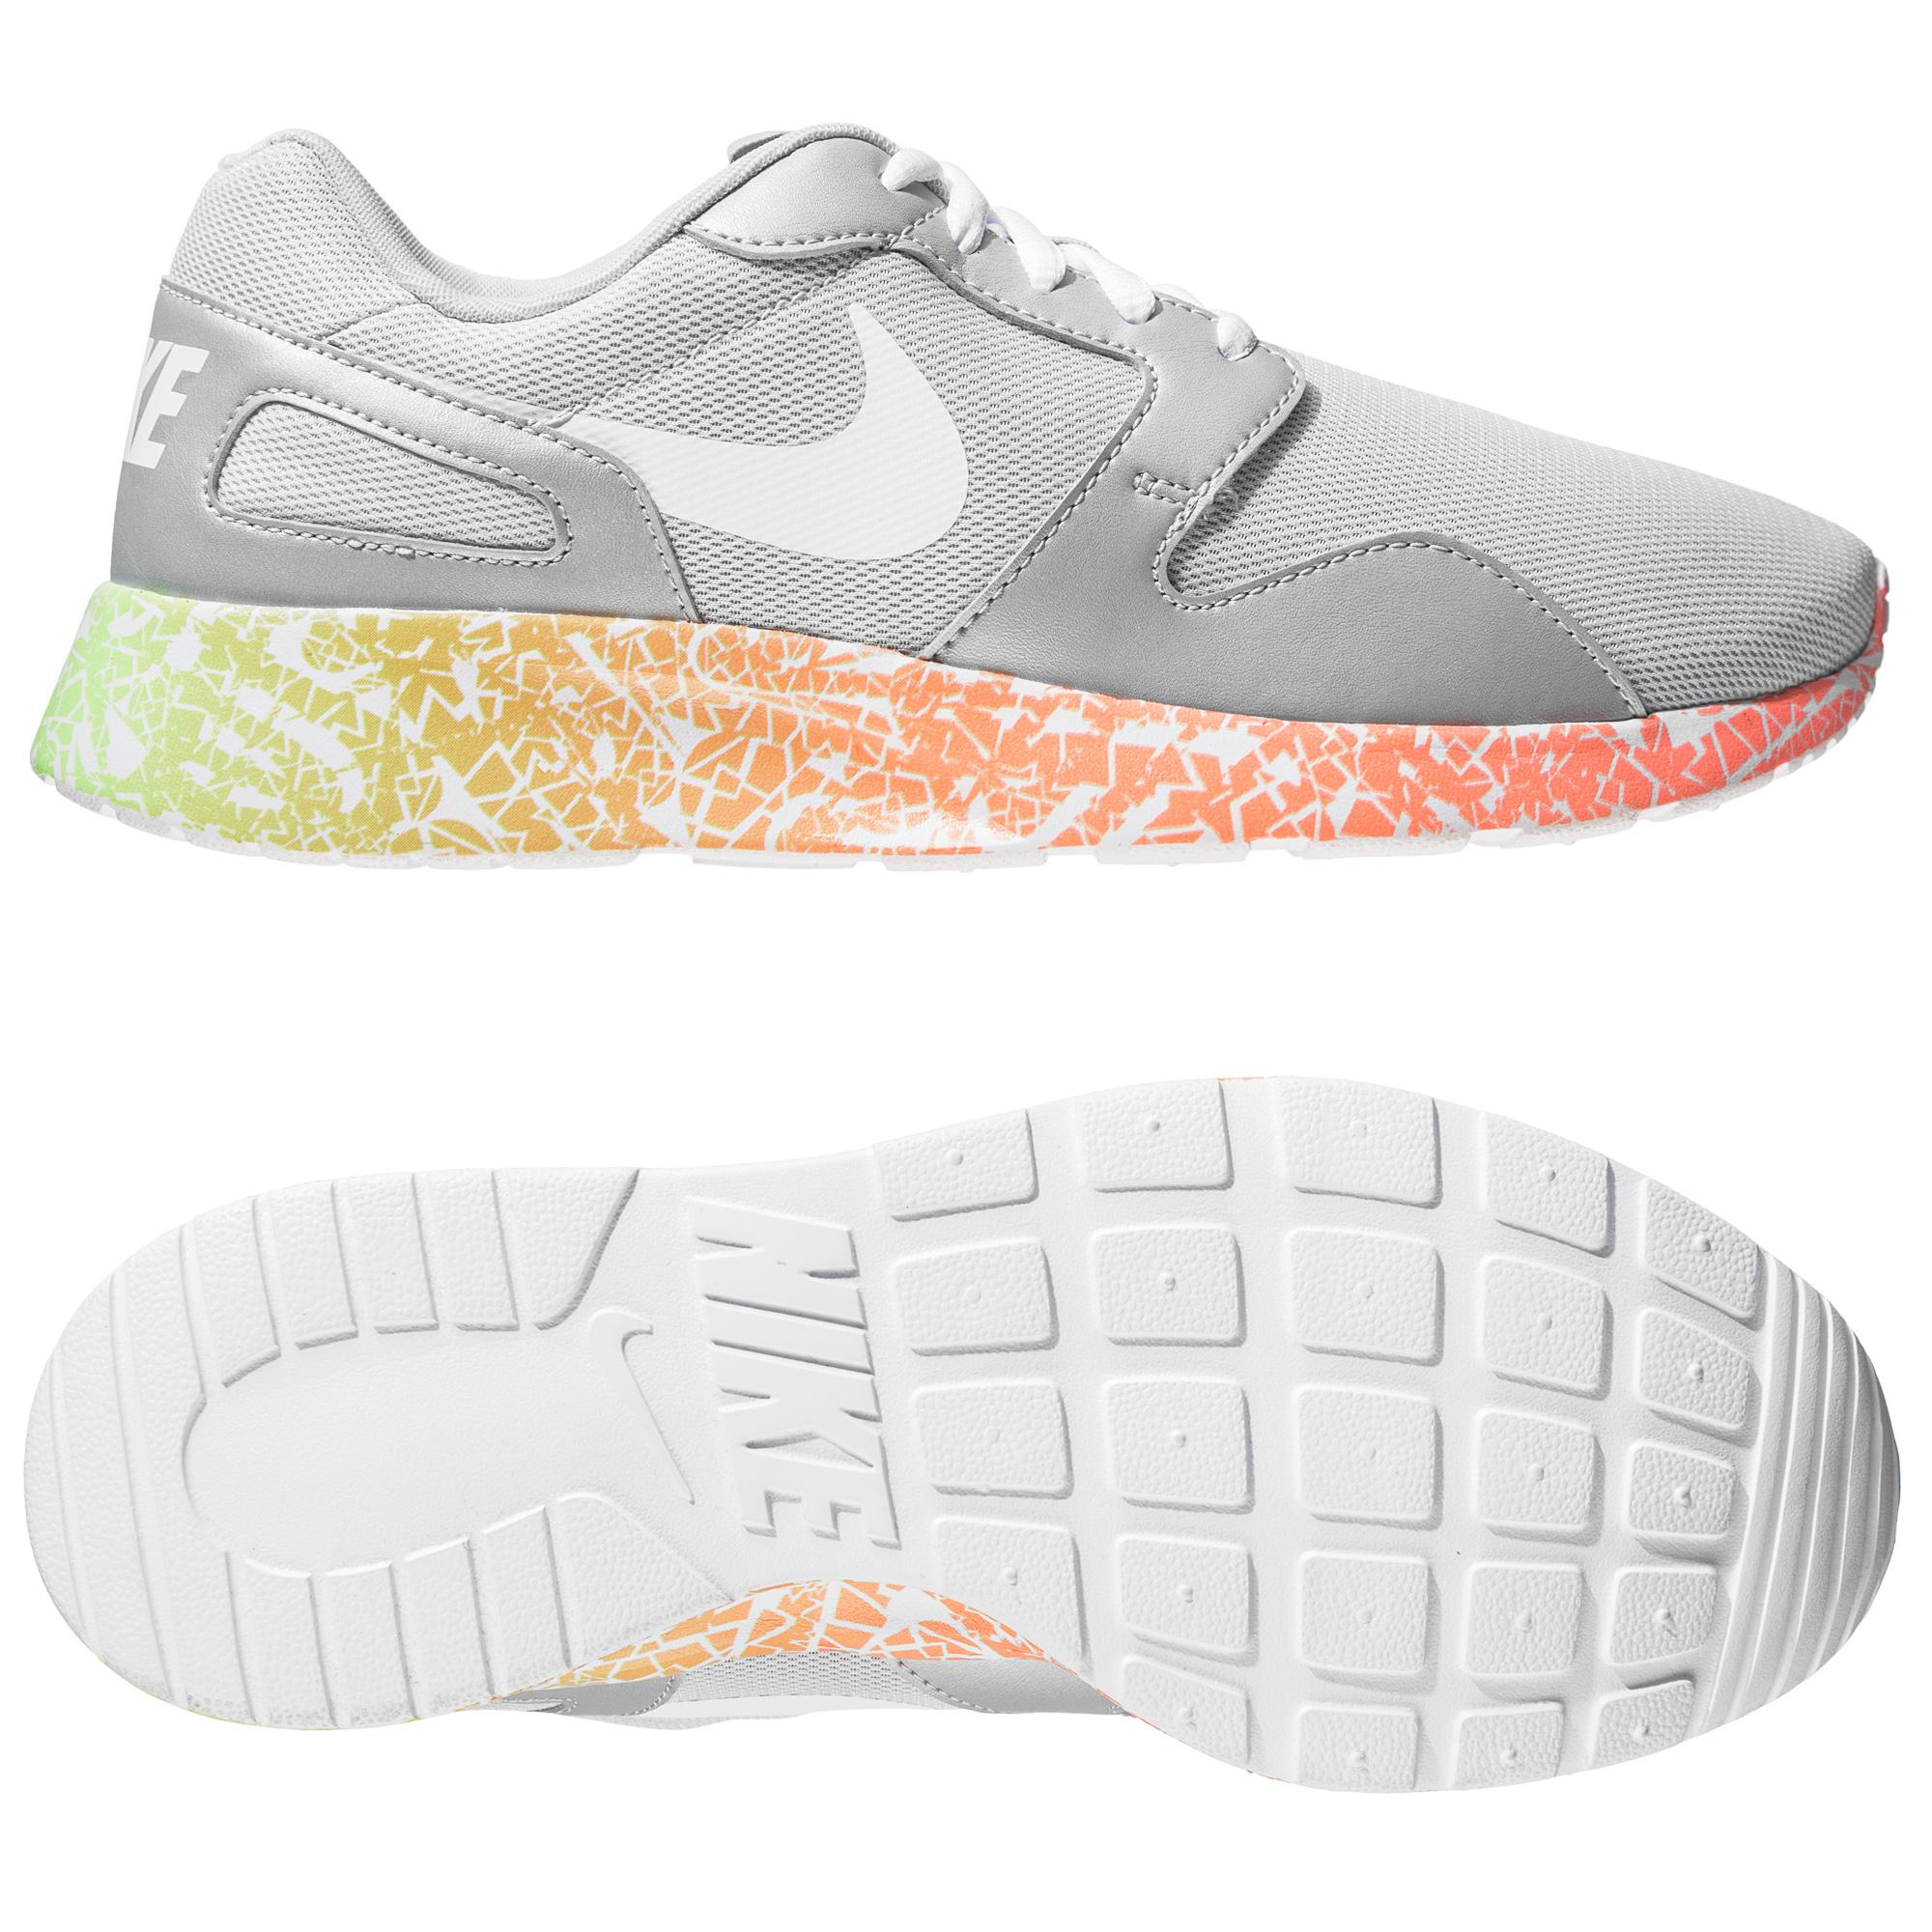 Nike Kaishi Run Print Silver/Vit Dam